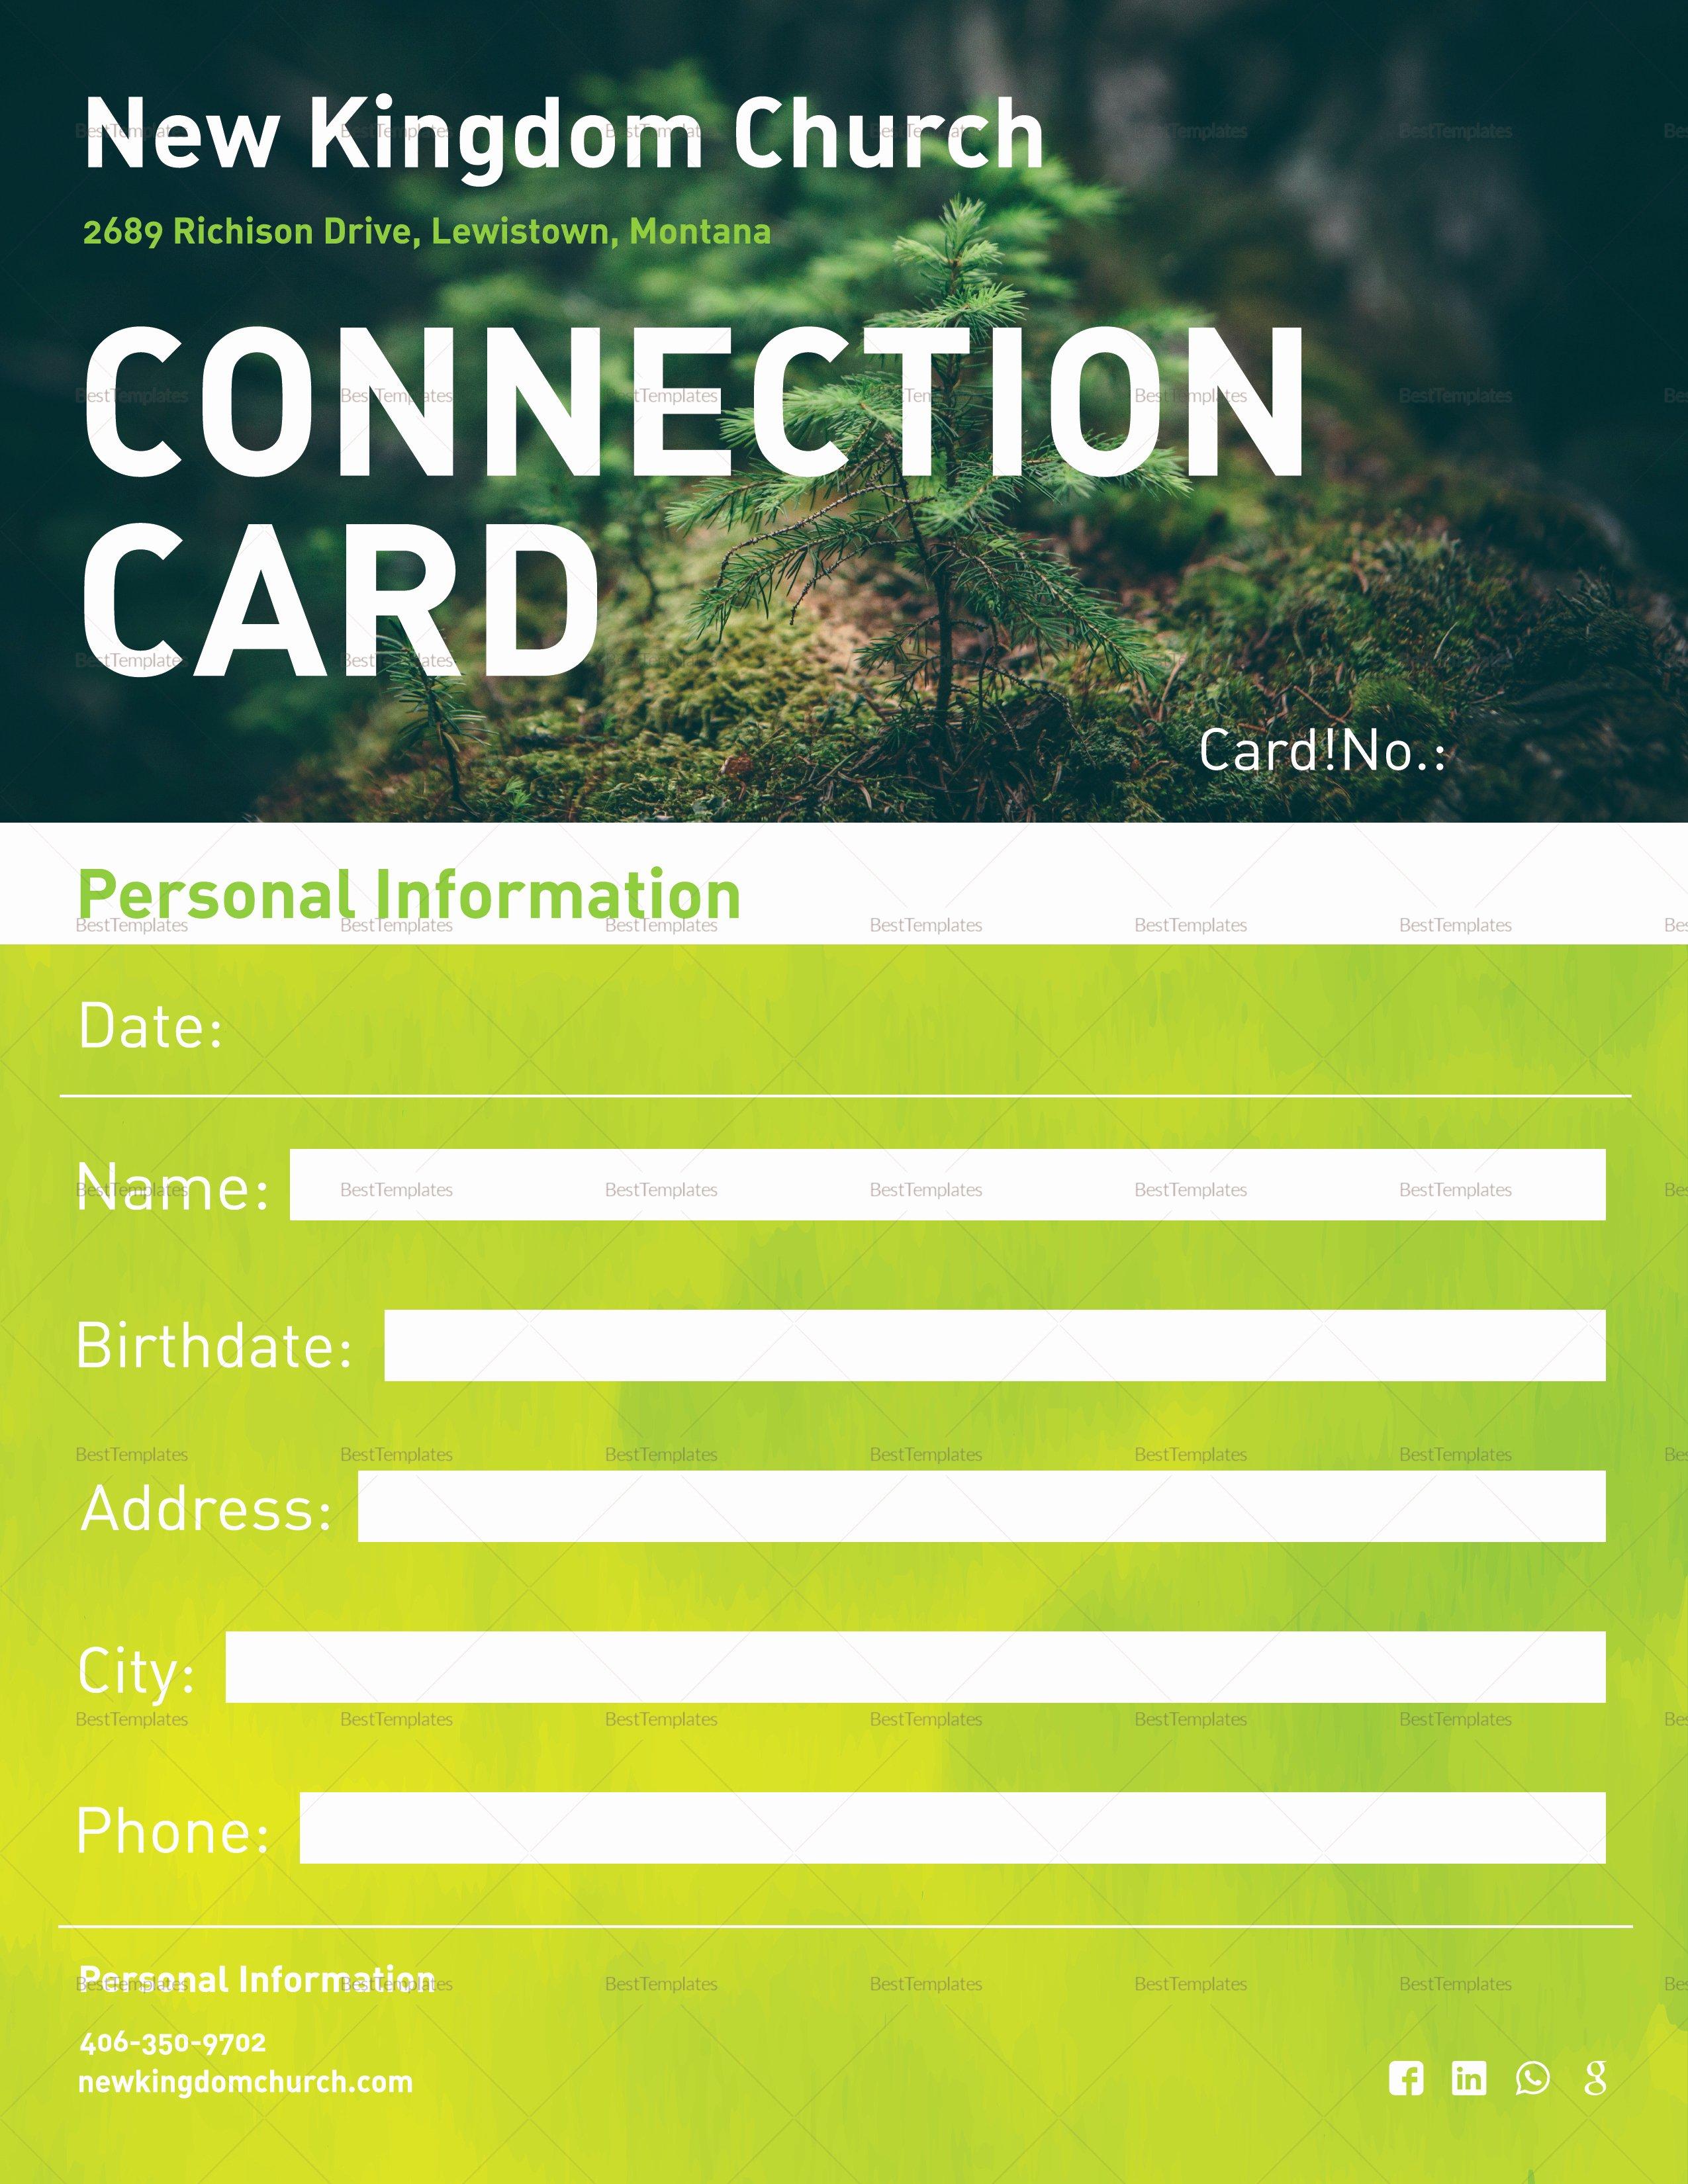 Church Bulletin Templates Microsoft Publisher Fresh Church Bulletin and Connect Card Flyer Design Template In